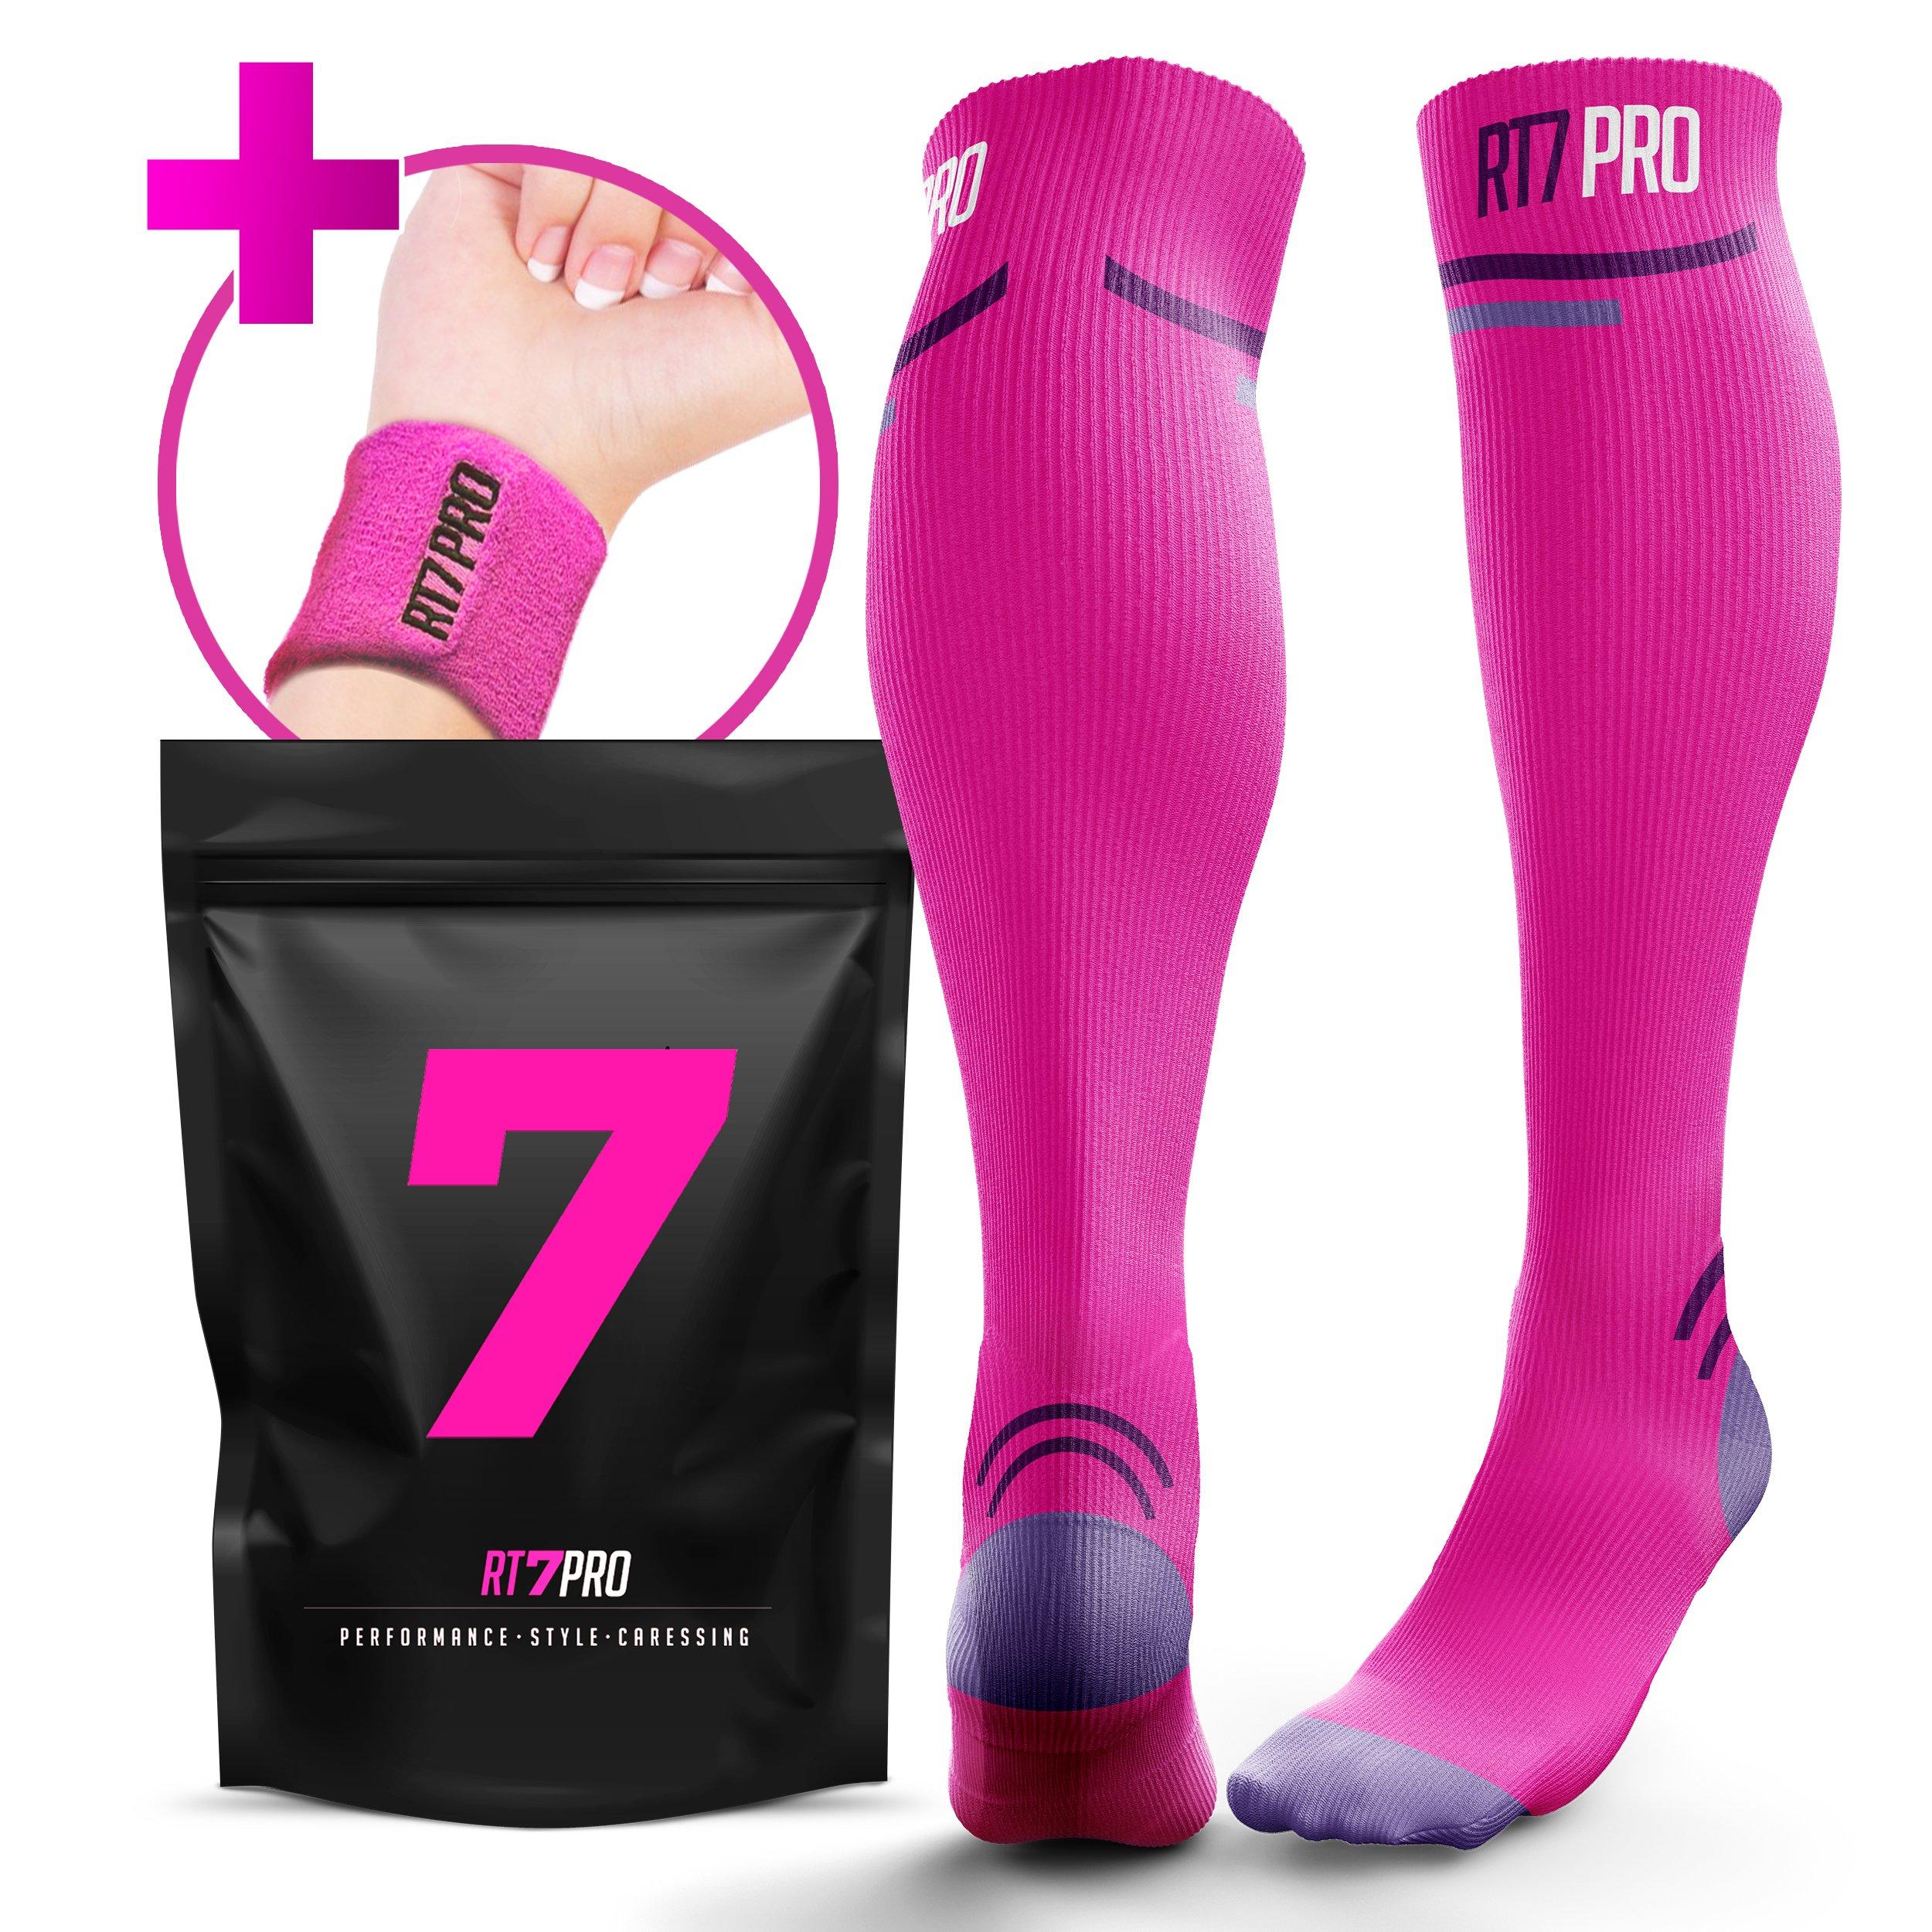 bf113e89fd Running Compression Socks - Pro Compression Socks for Women & Men - Knee  High Socks for